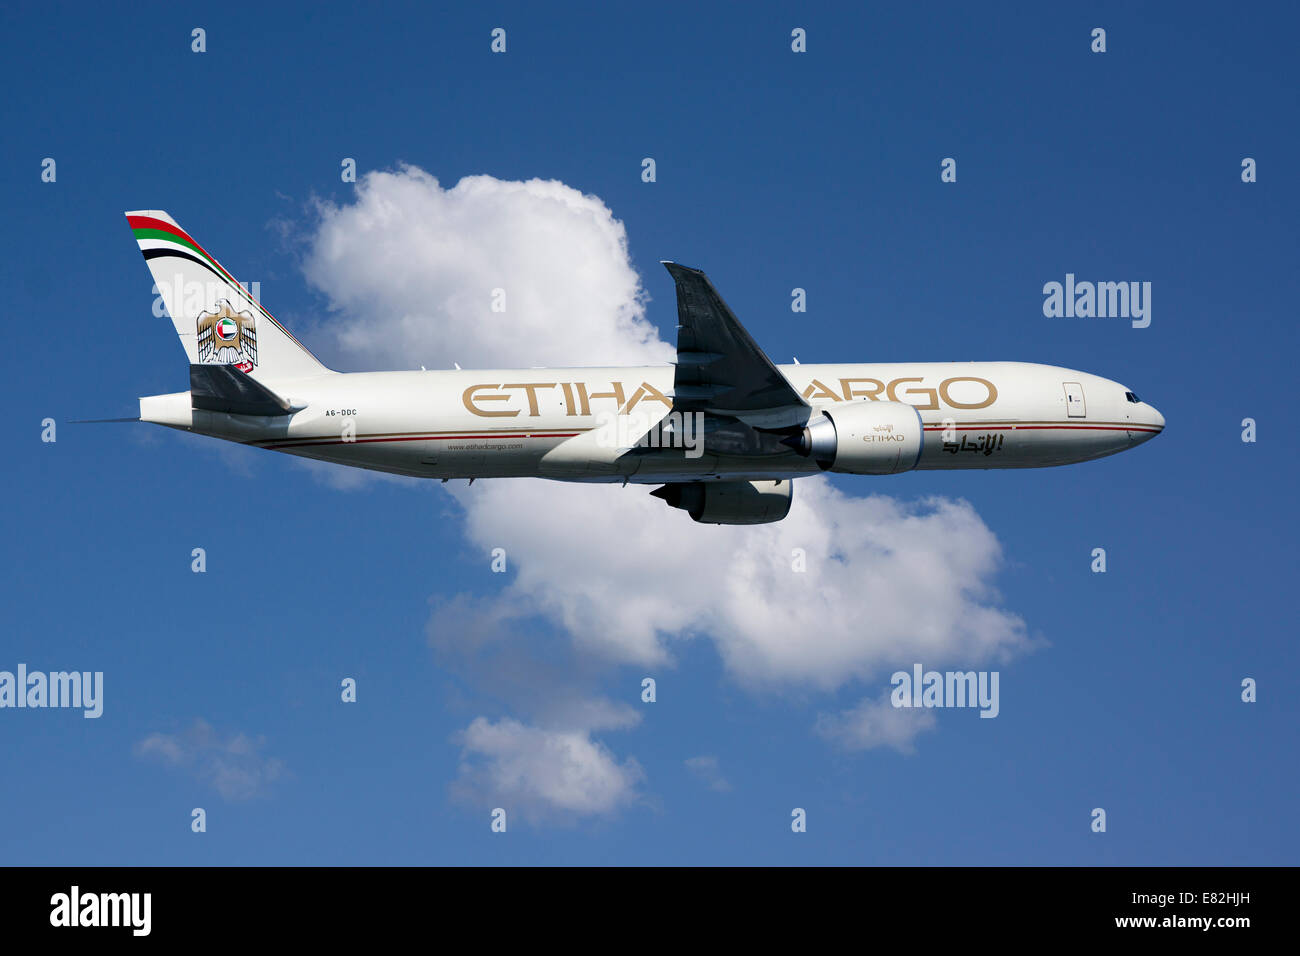 Etihad Boeing 777 Stock Photos & Etihad Boeing 777 Stock